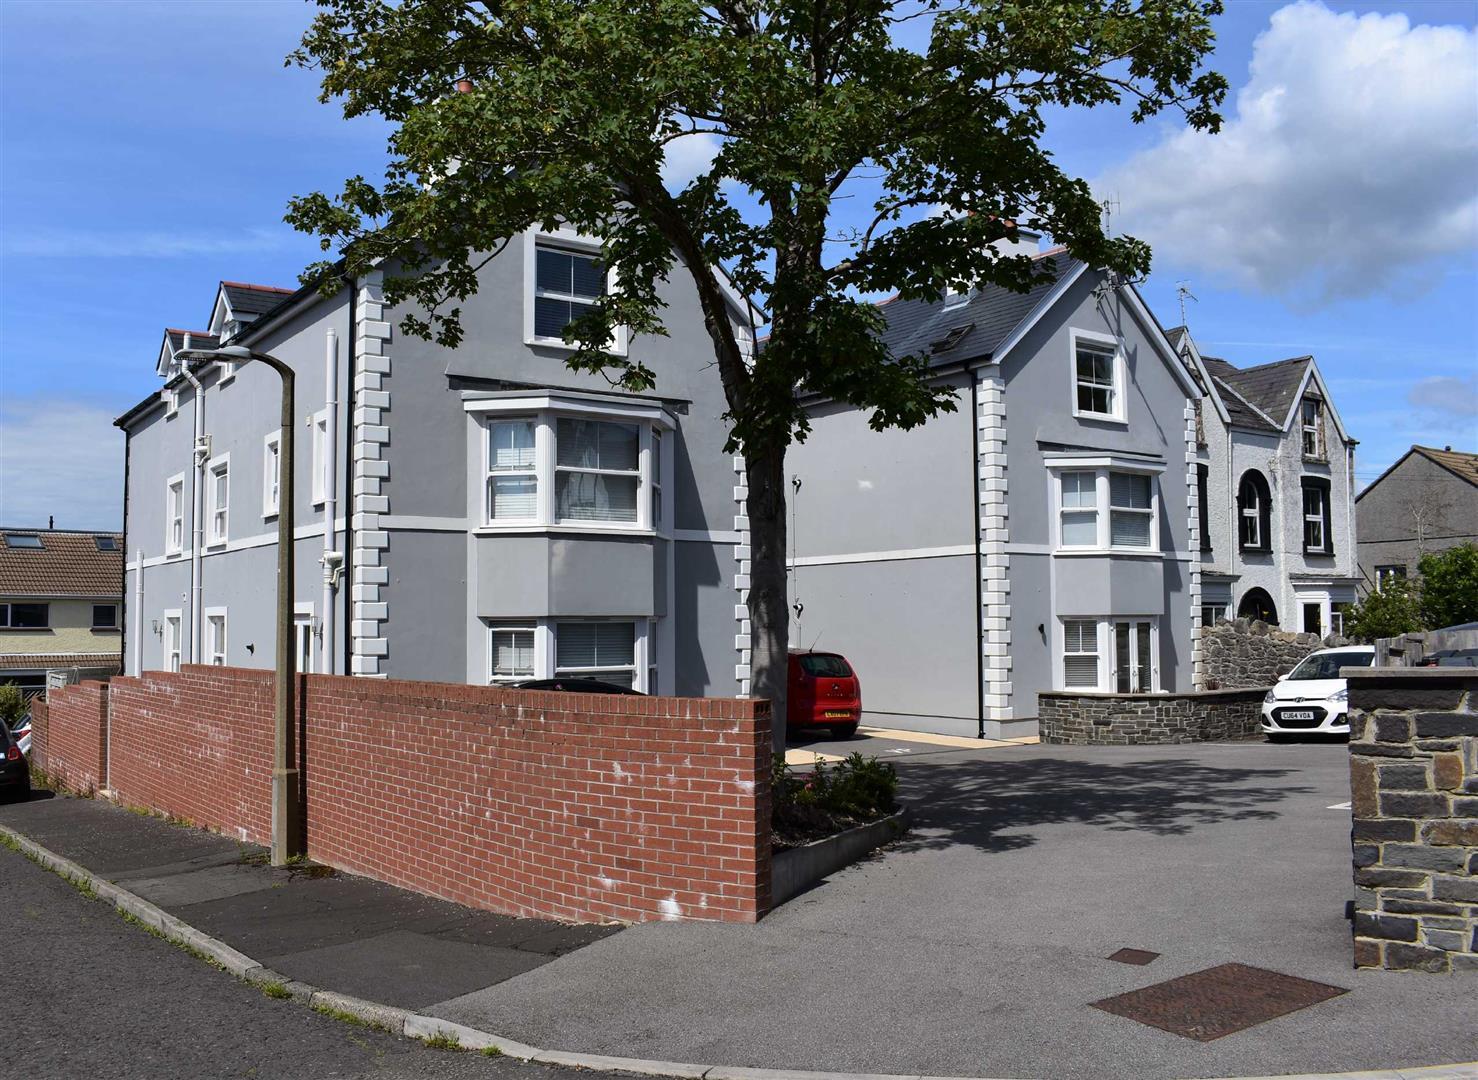 Overland Road, Mumbles, Swansea, SA3 4LP